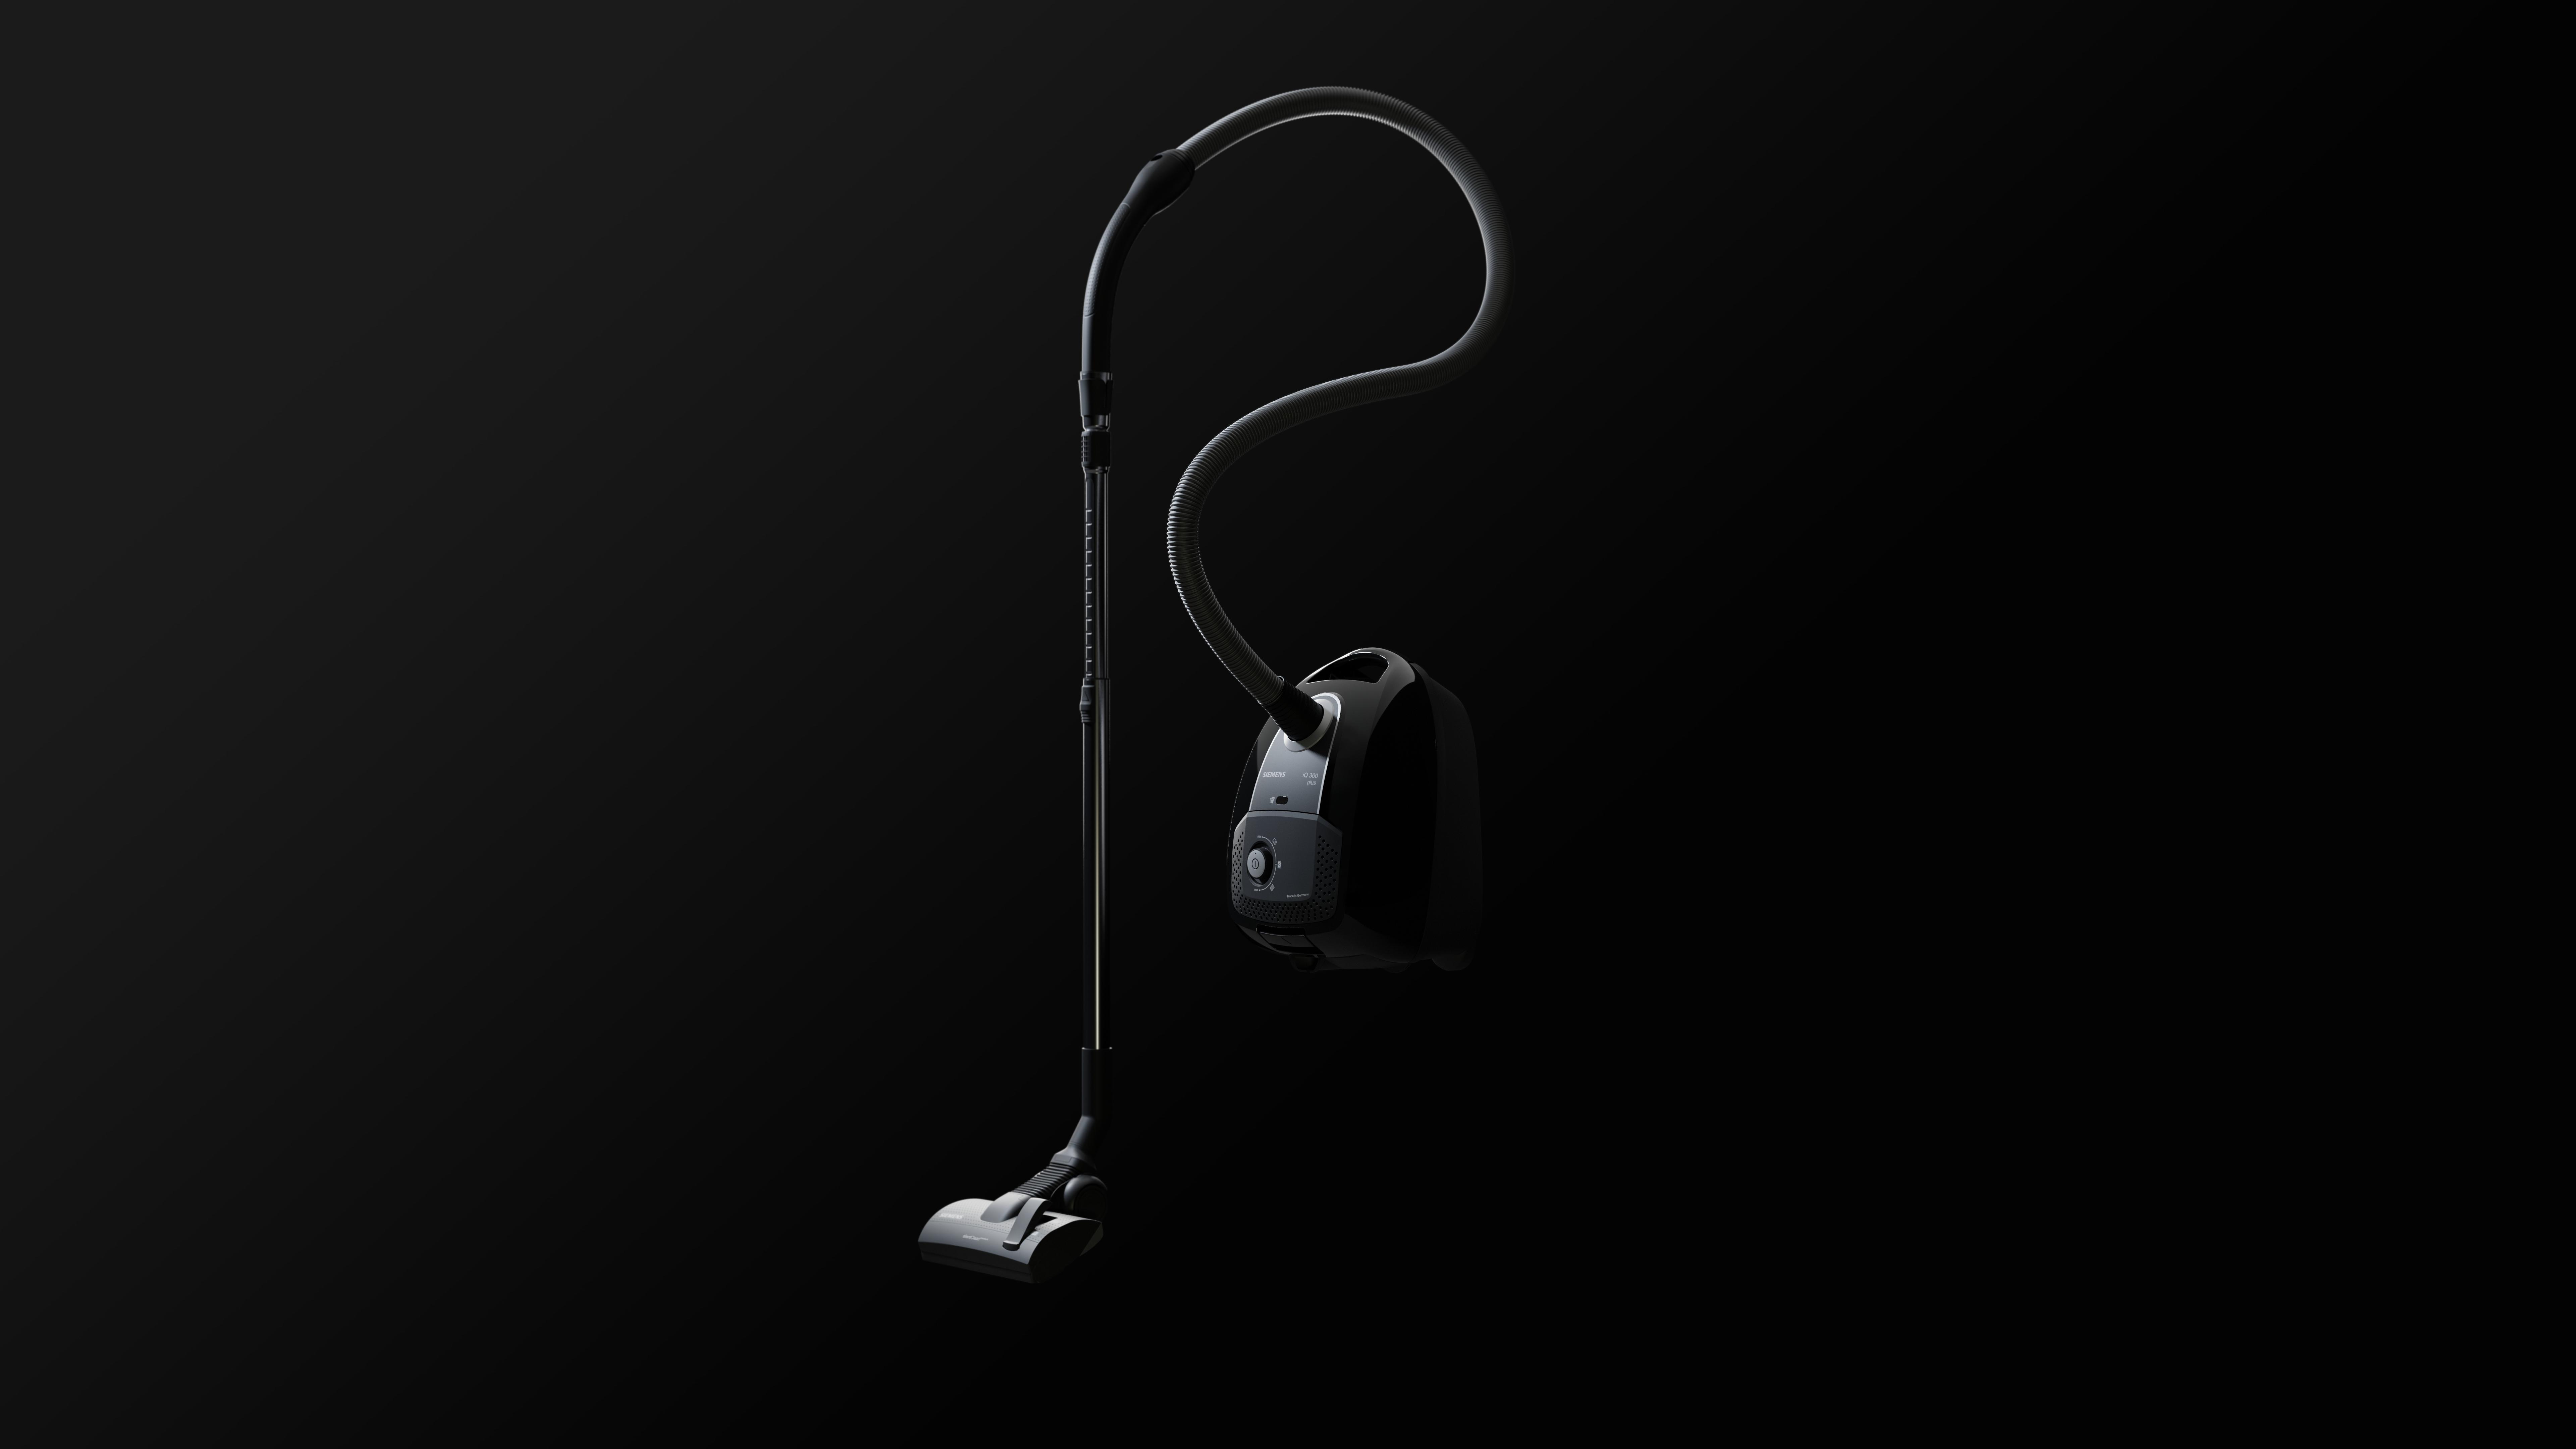 black vacuum cleaner standing on black background